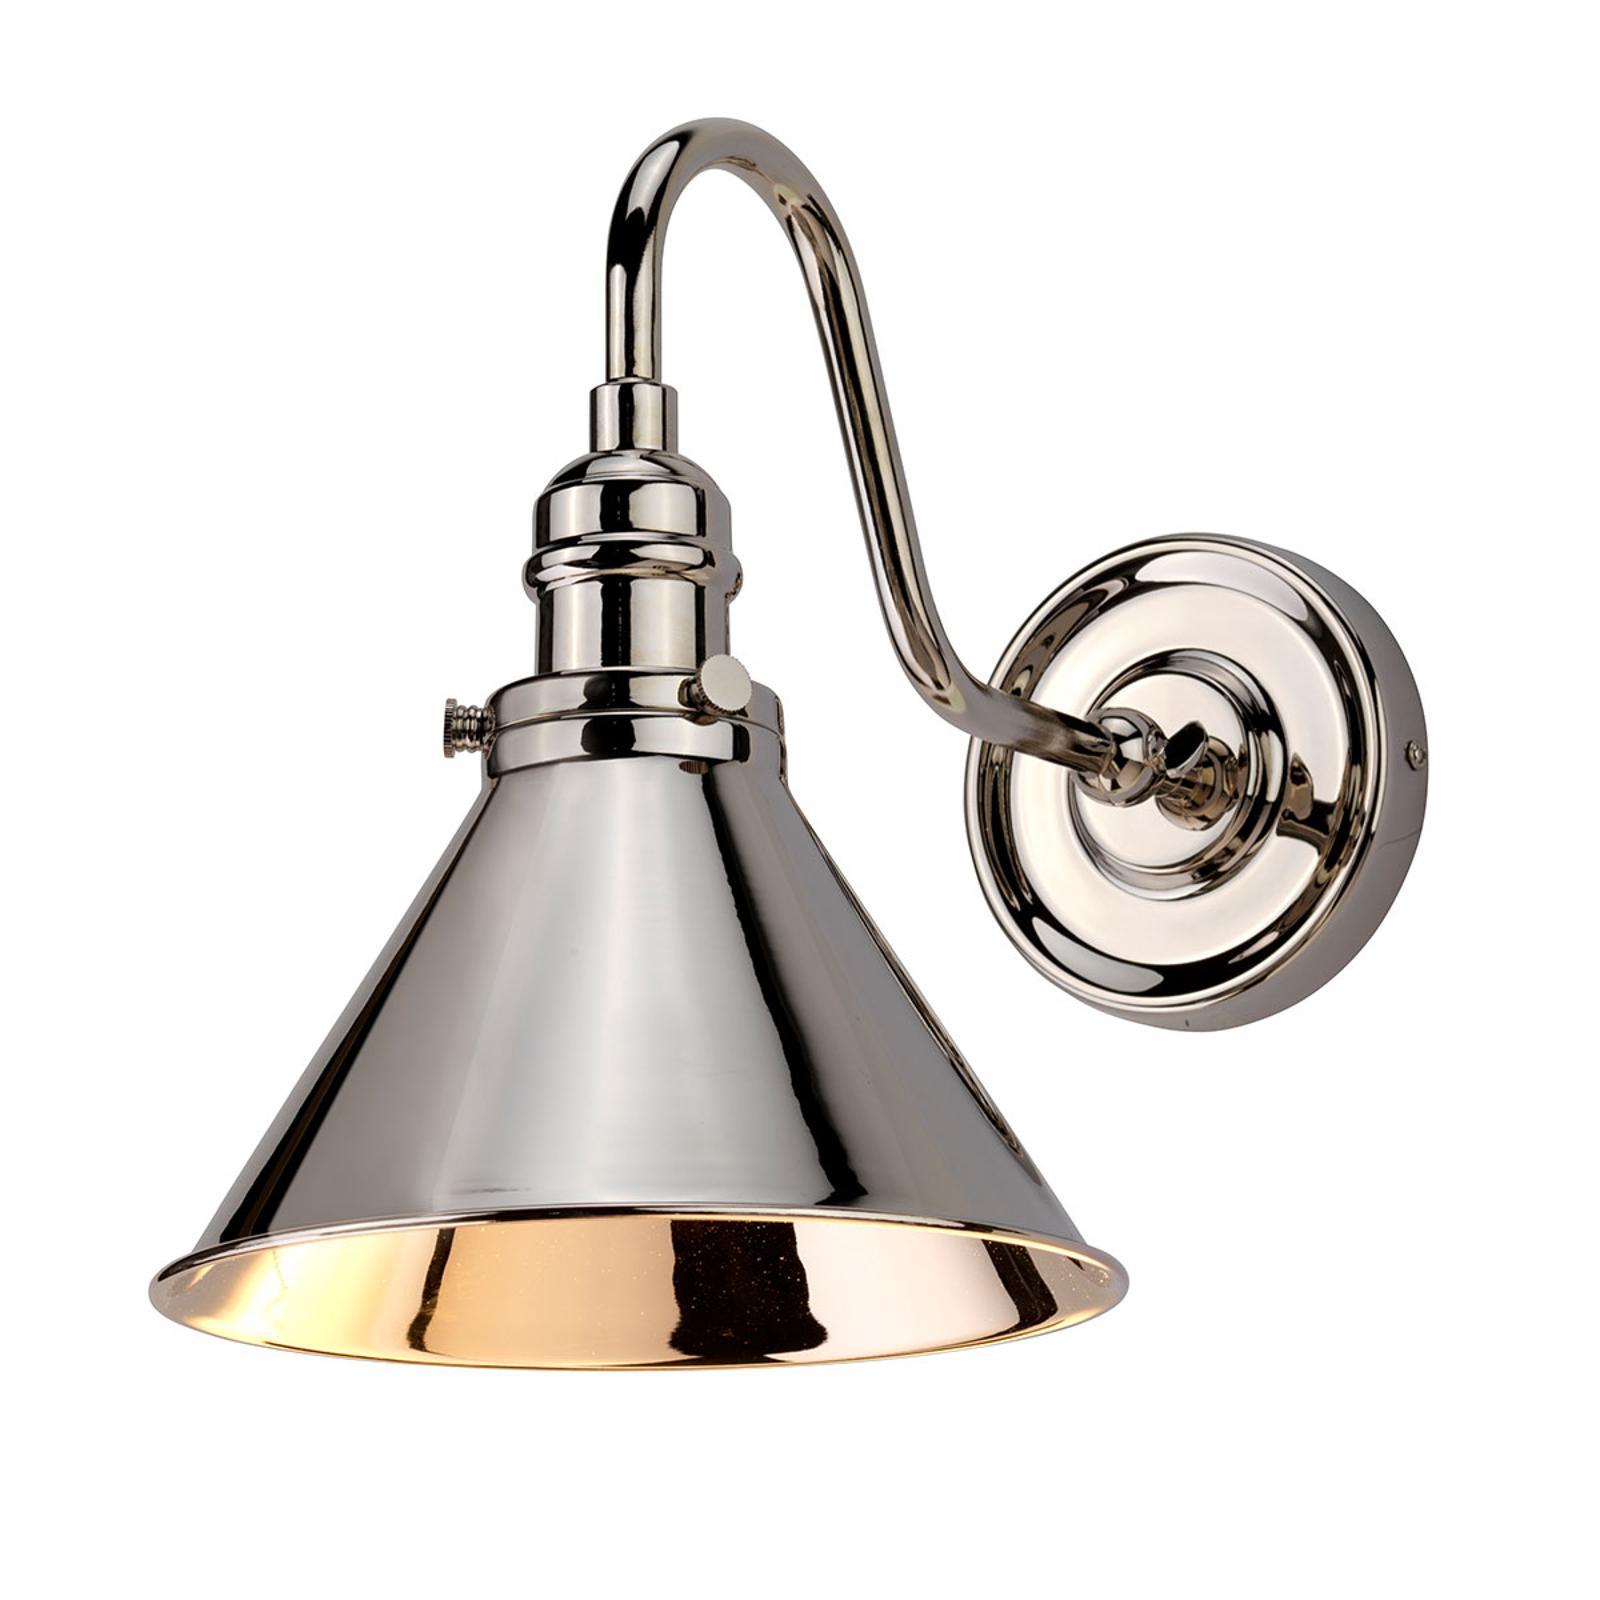 Wandlamp Provence, nikkel gepolijst